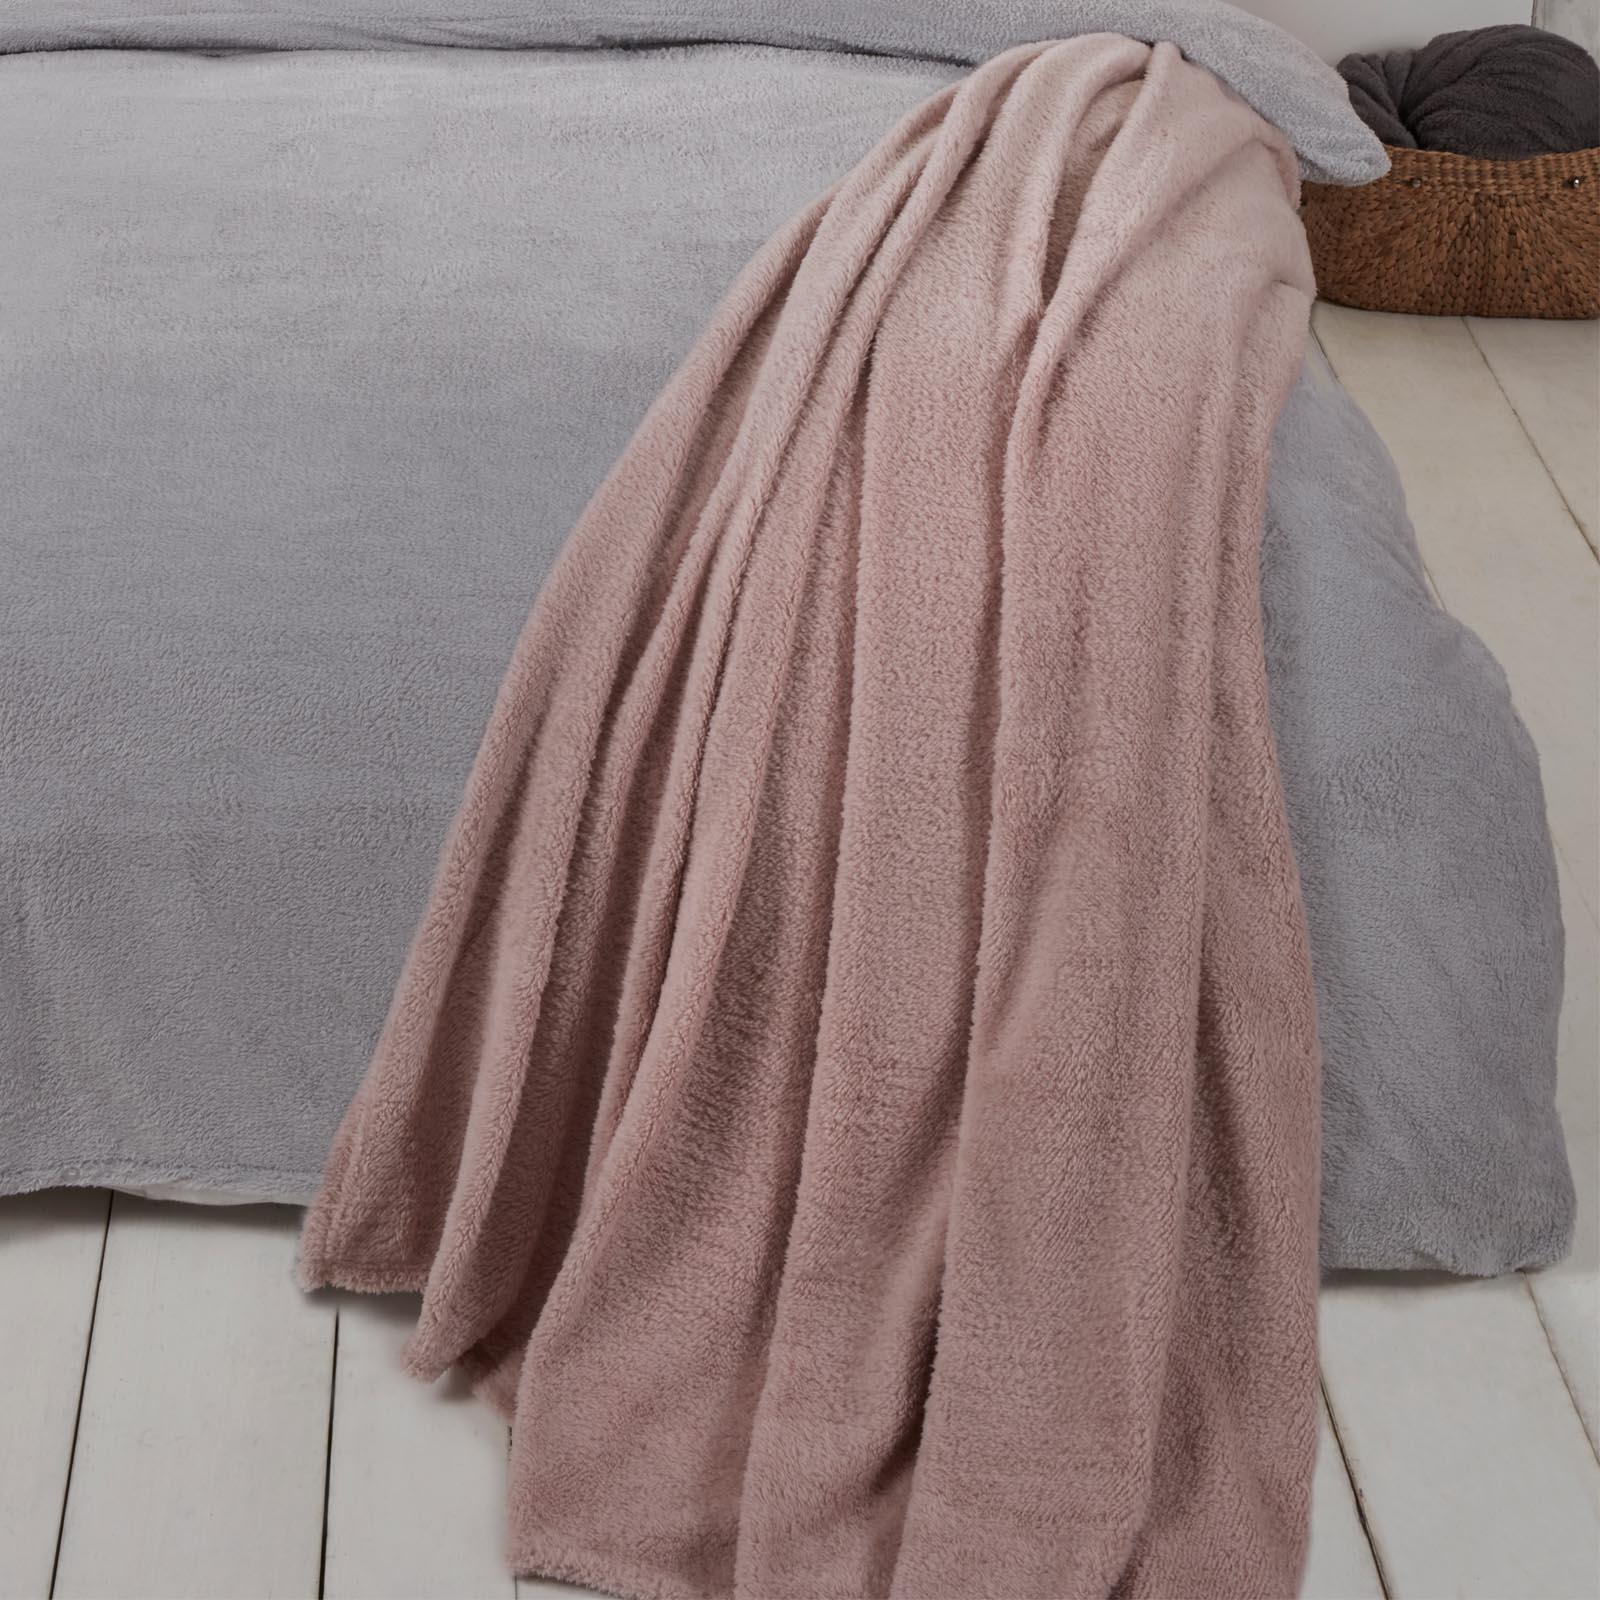 Brentfords-Teddy-Fleece-Bear-Blanket-Large-Throw-Over-Bed-Plush-Soft-Bedspread thumbnail 8